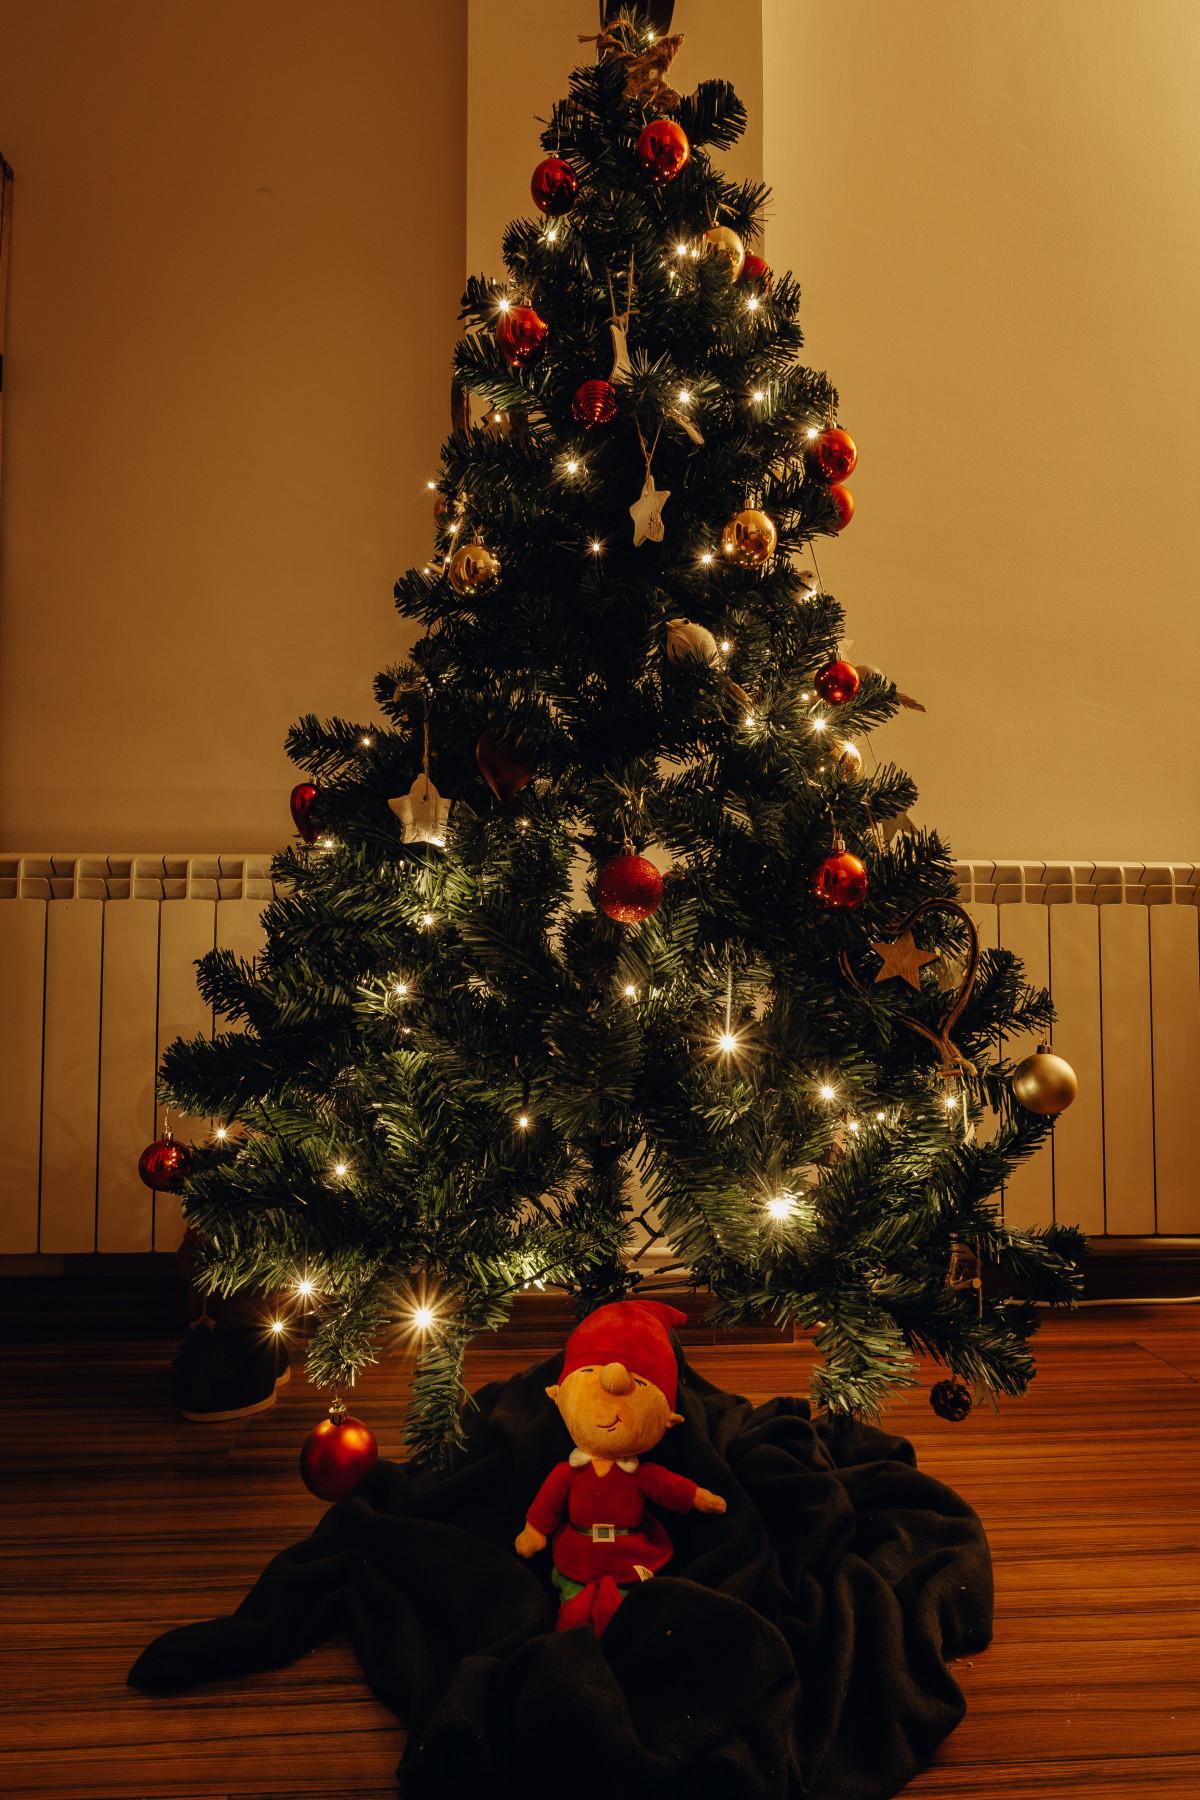 celebration christmas christmas balls christmas decoration christmas lights christmas tree conifer decoration hanging lights public domain images